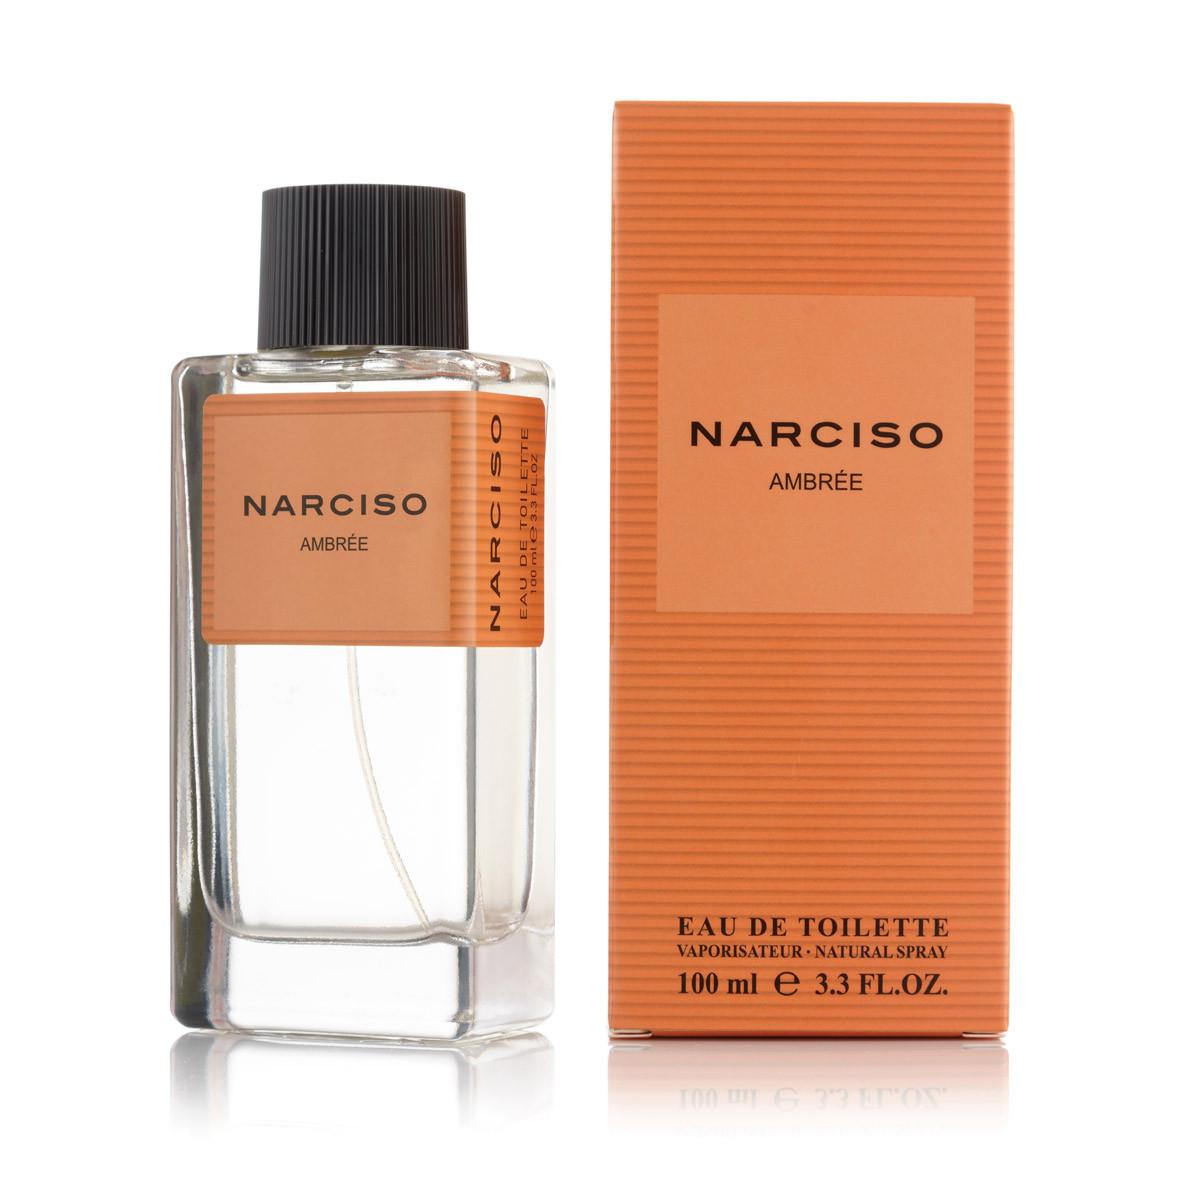 100 мл туалетная вода Narciso Rodriguez Narciso Ambree - Ж (new)